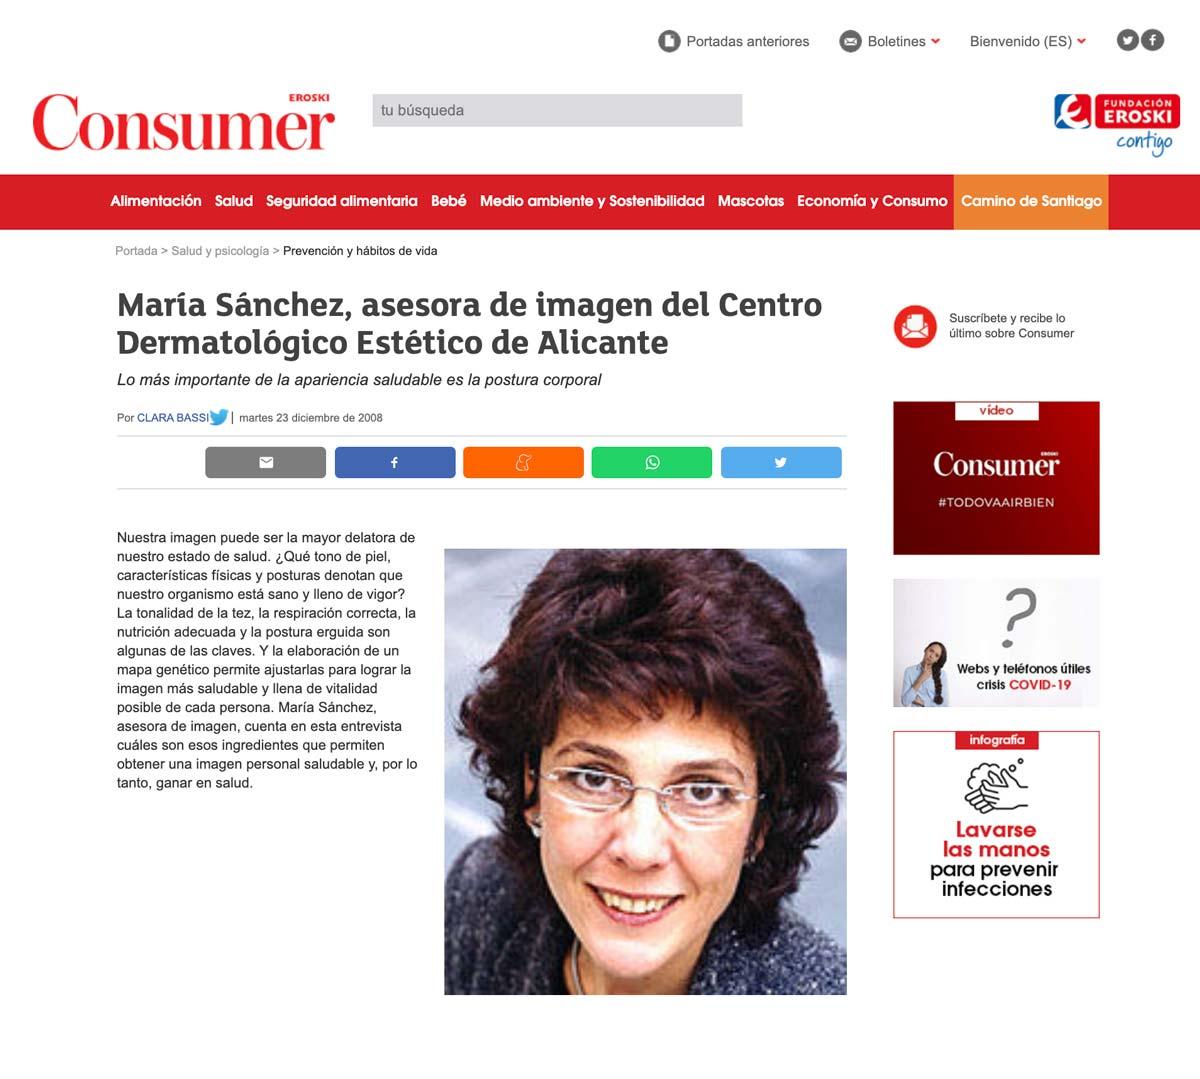 Asesoria-Imagen-Personal-Practica-Maria-A-Sanchez-eroski-consumer-postura-corporal-01